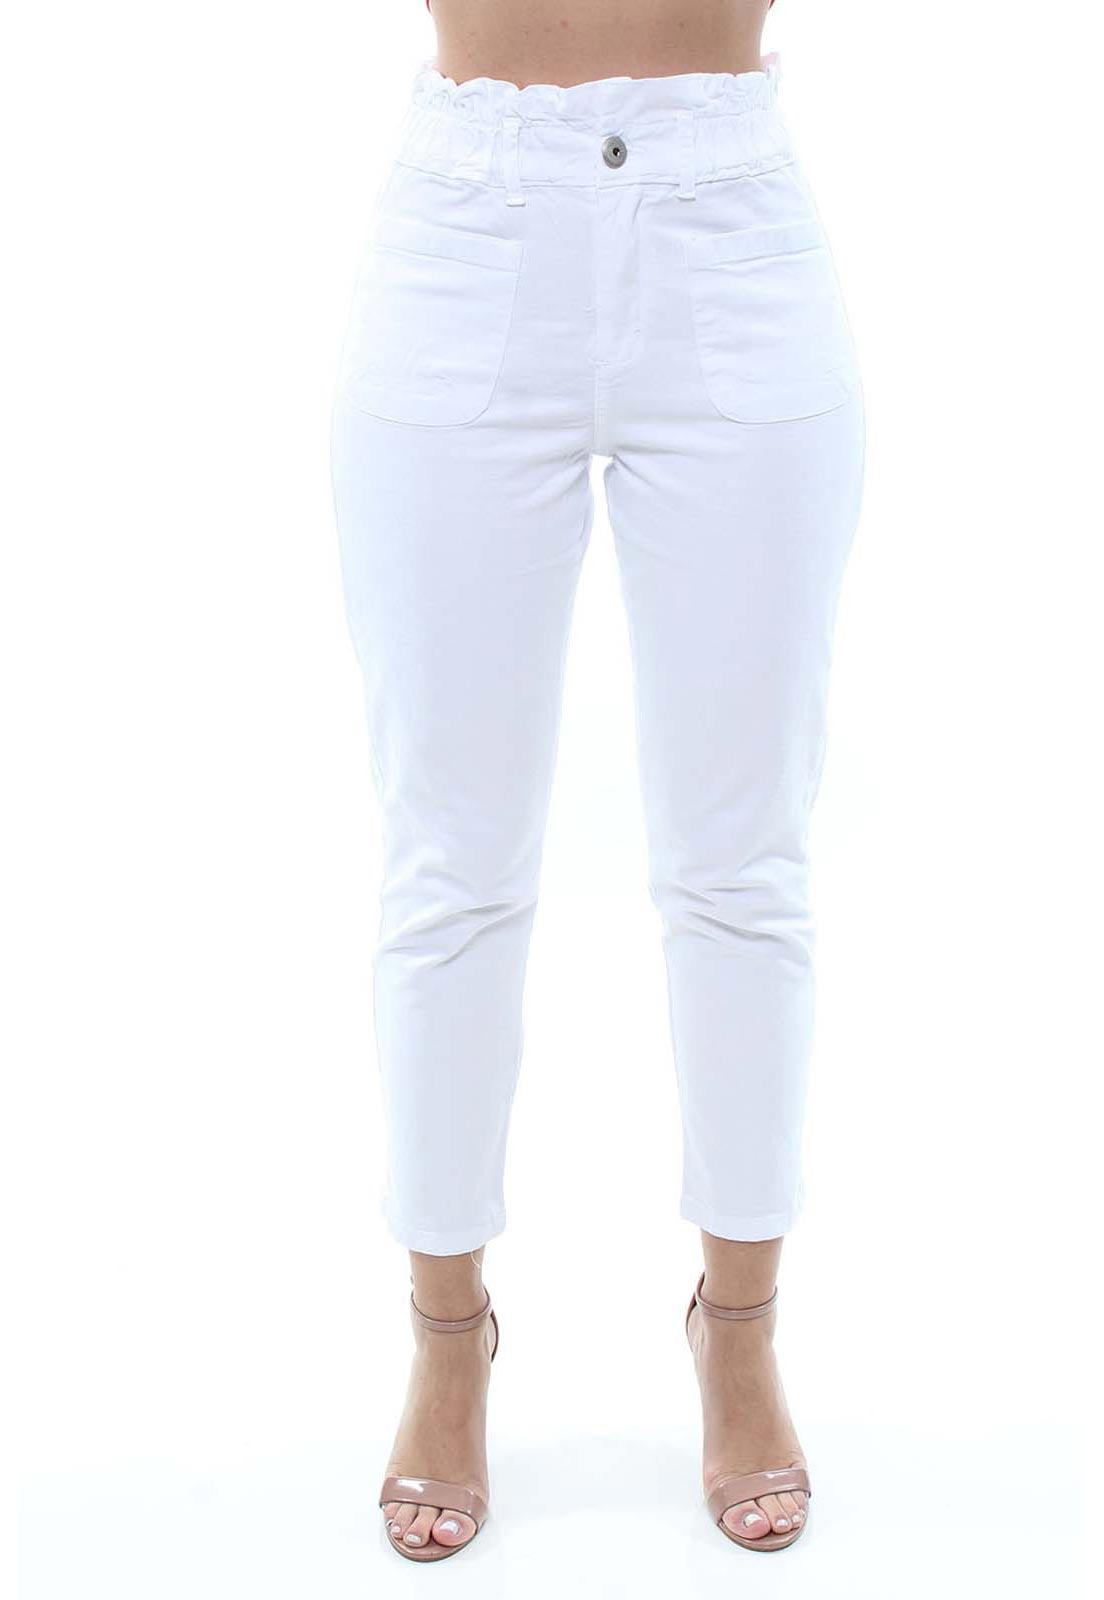 Calça Jeans Feminina Sarja Clochard Branca Crocker - 47717